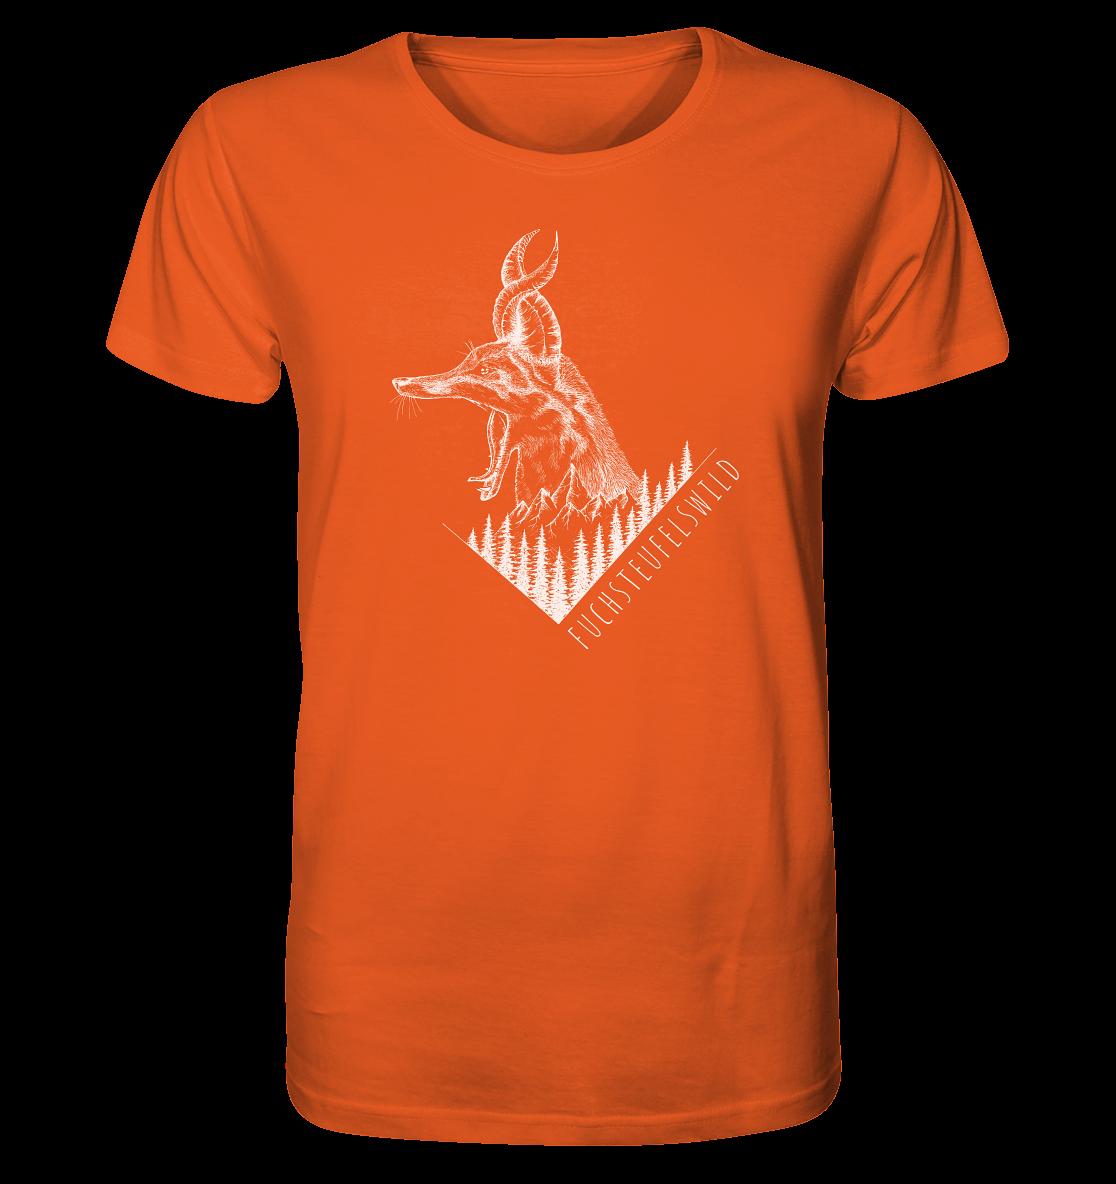 front-organic-shirt-ea5b23-1116x-7.png